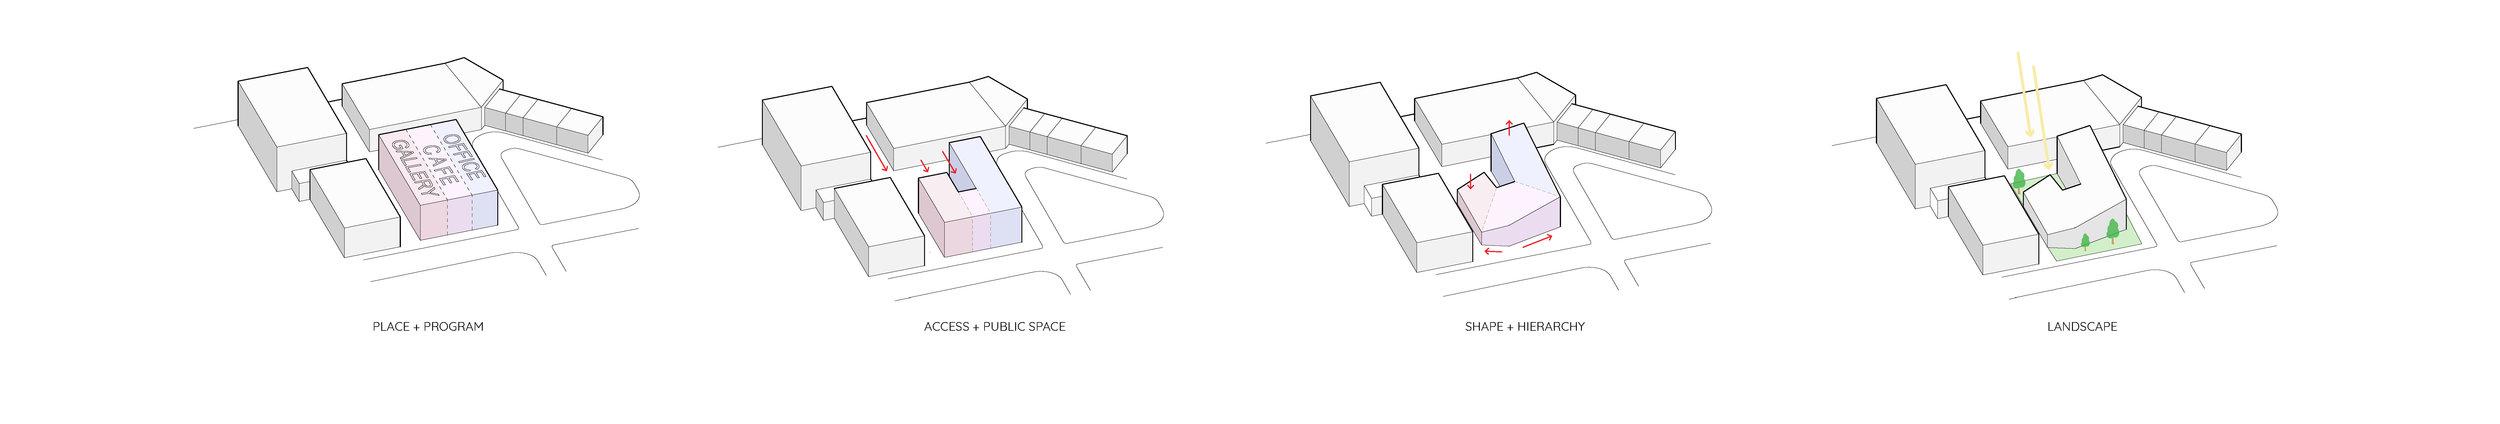 final diagrams.jpg